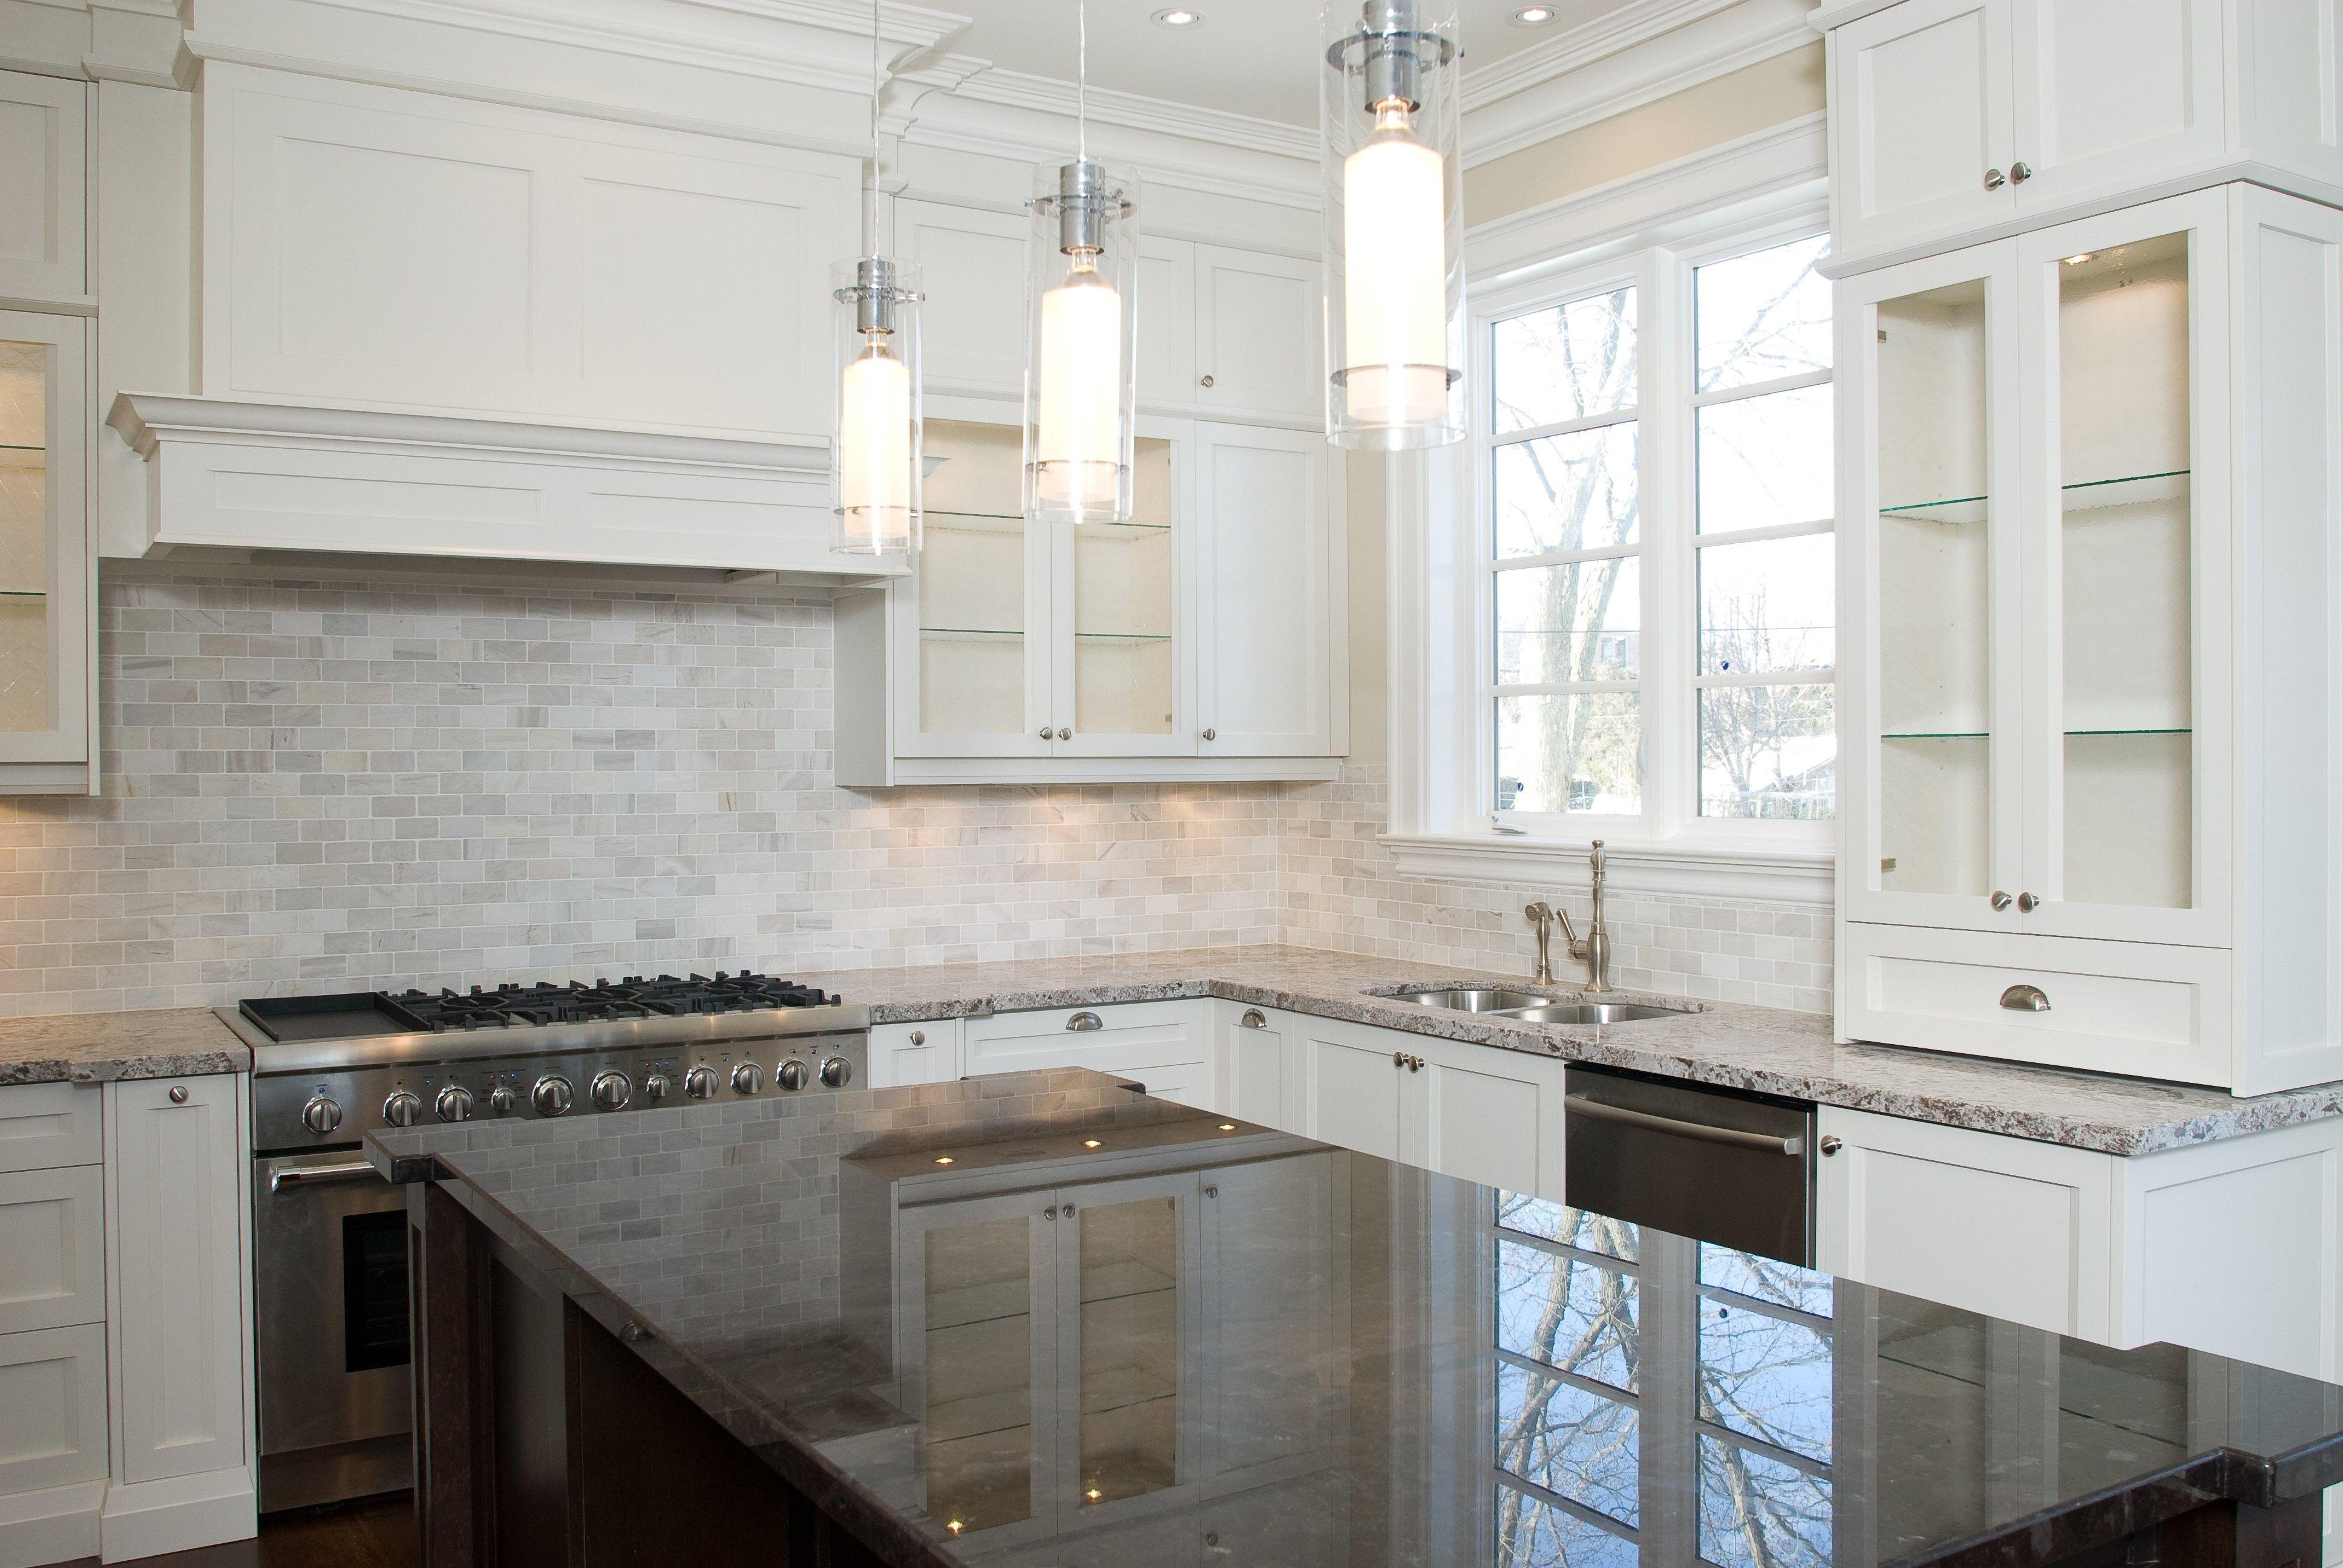 kitchen mirror ceramic cabinets l backsplash countertops white tile